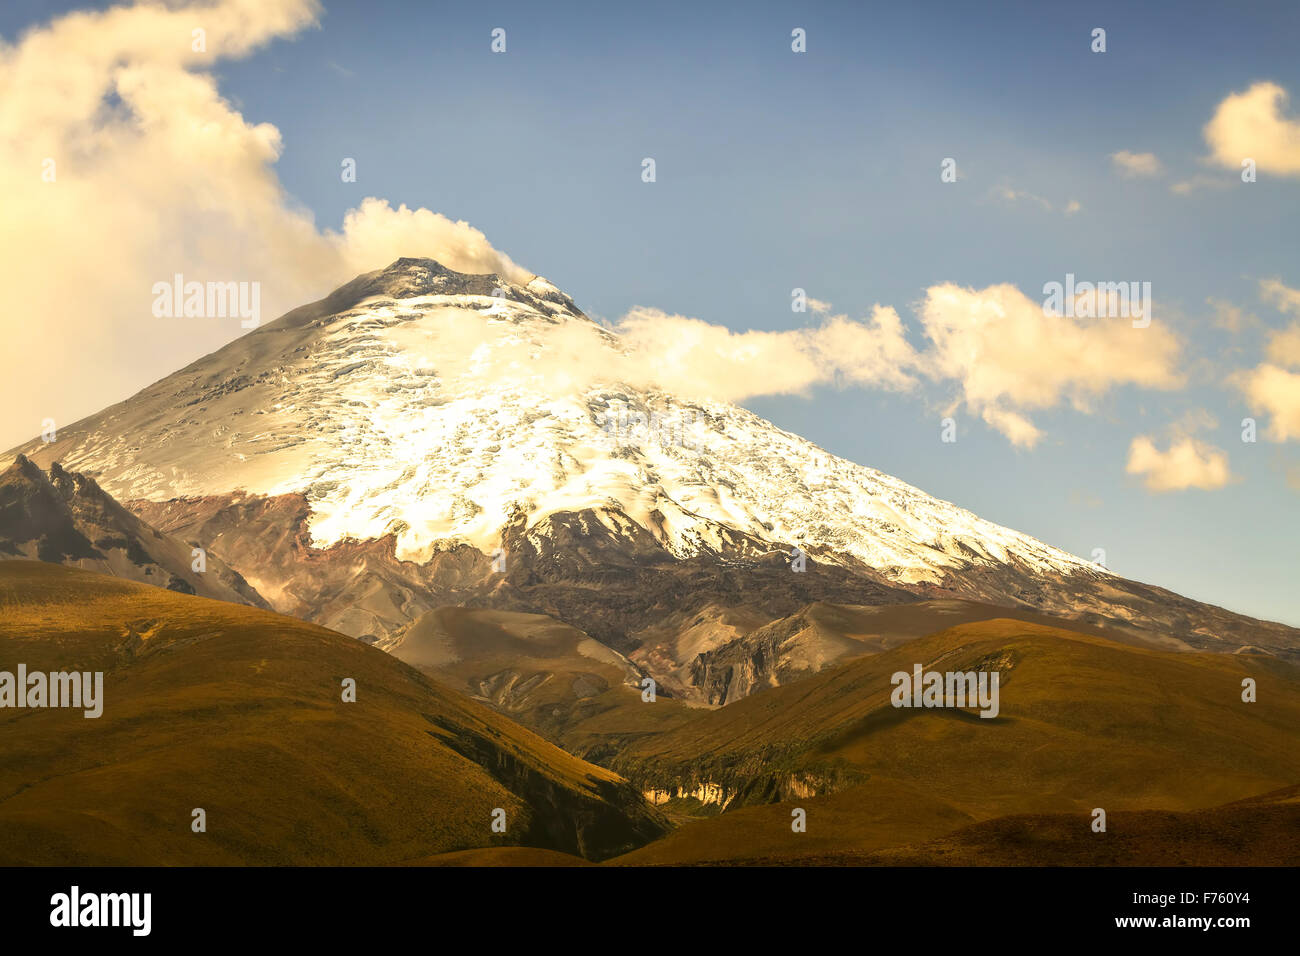 Cotopaxi Volcano Violent Day Explosion, Ecuador, South America - Stock Image